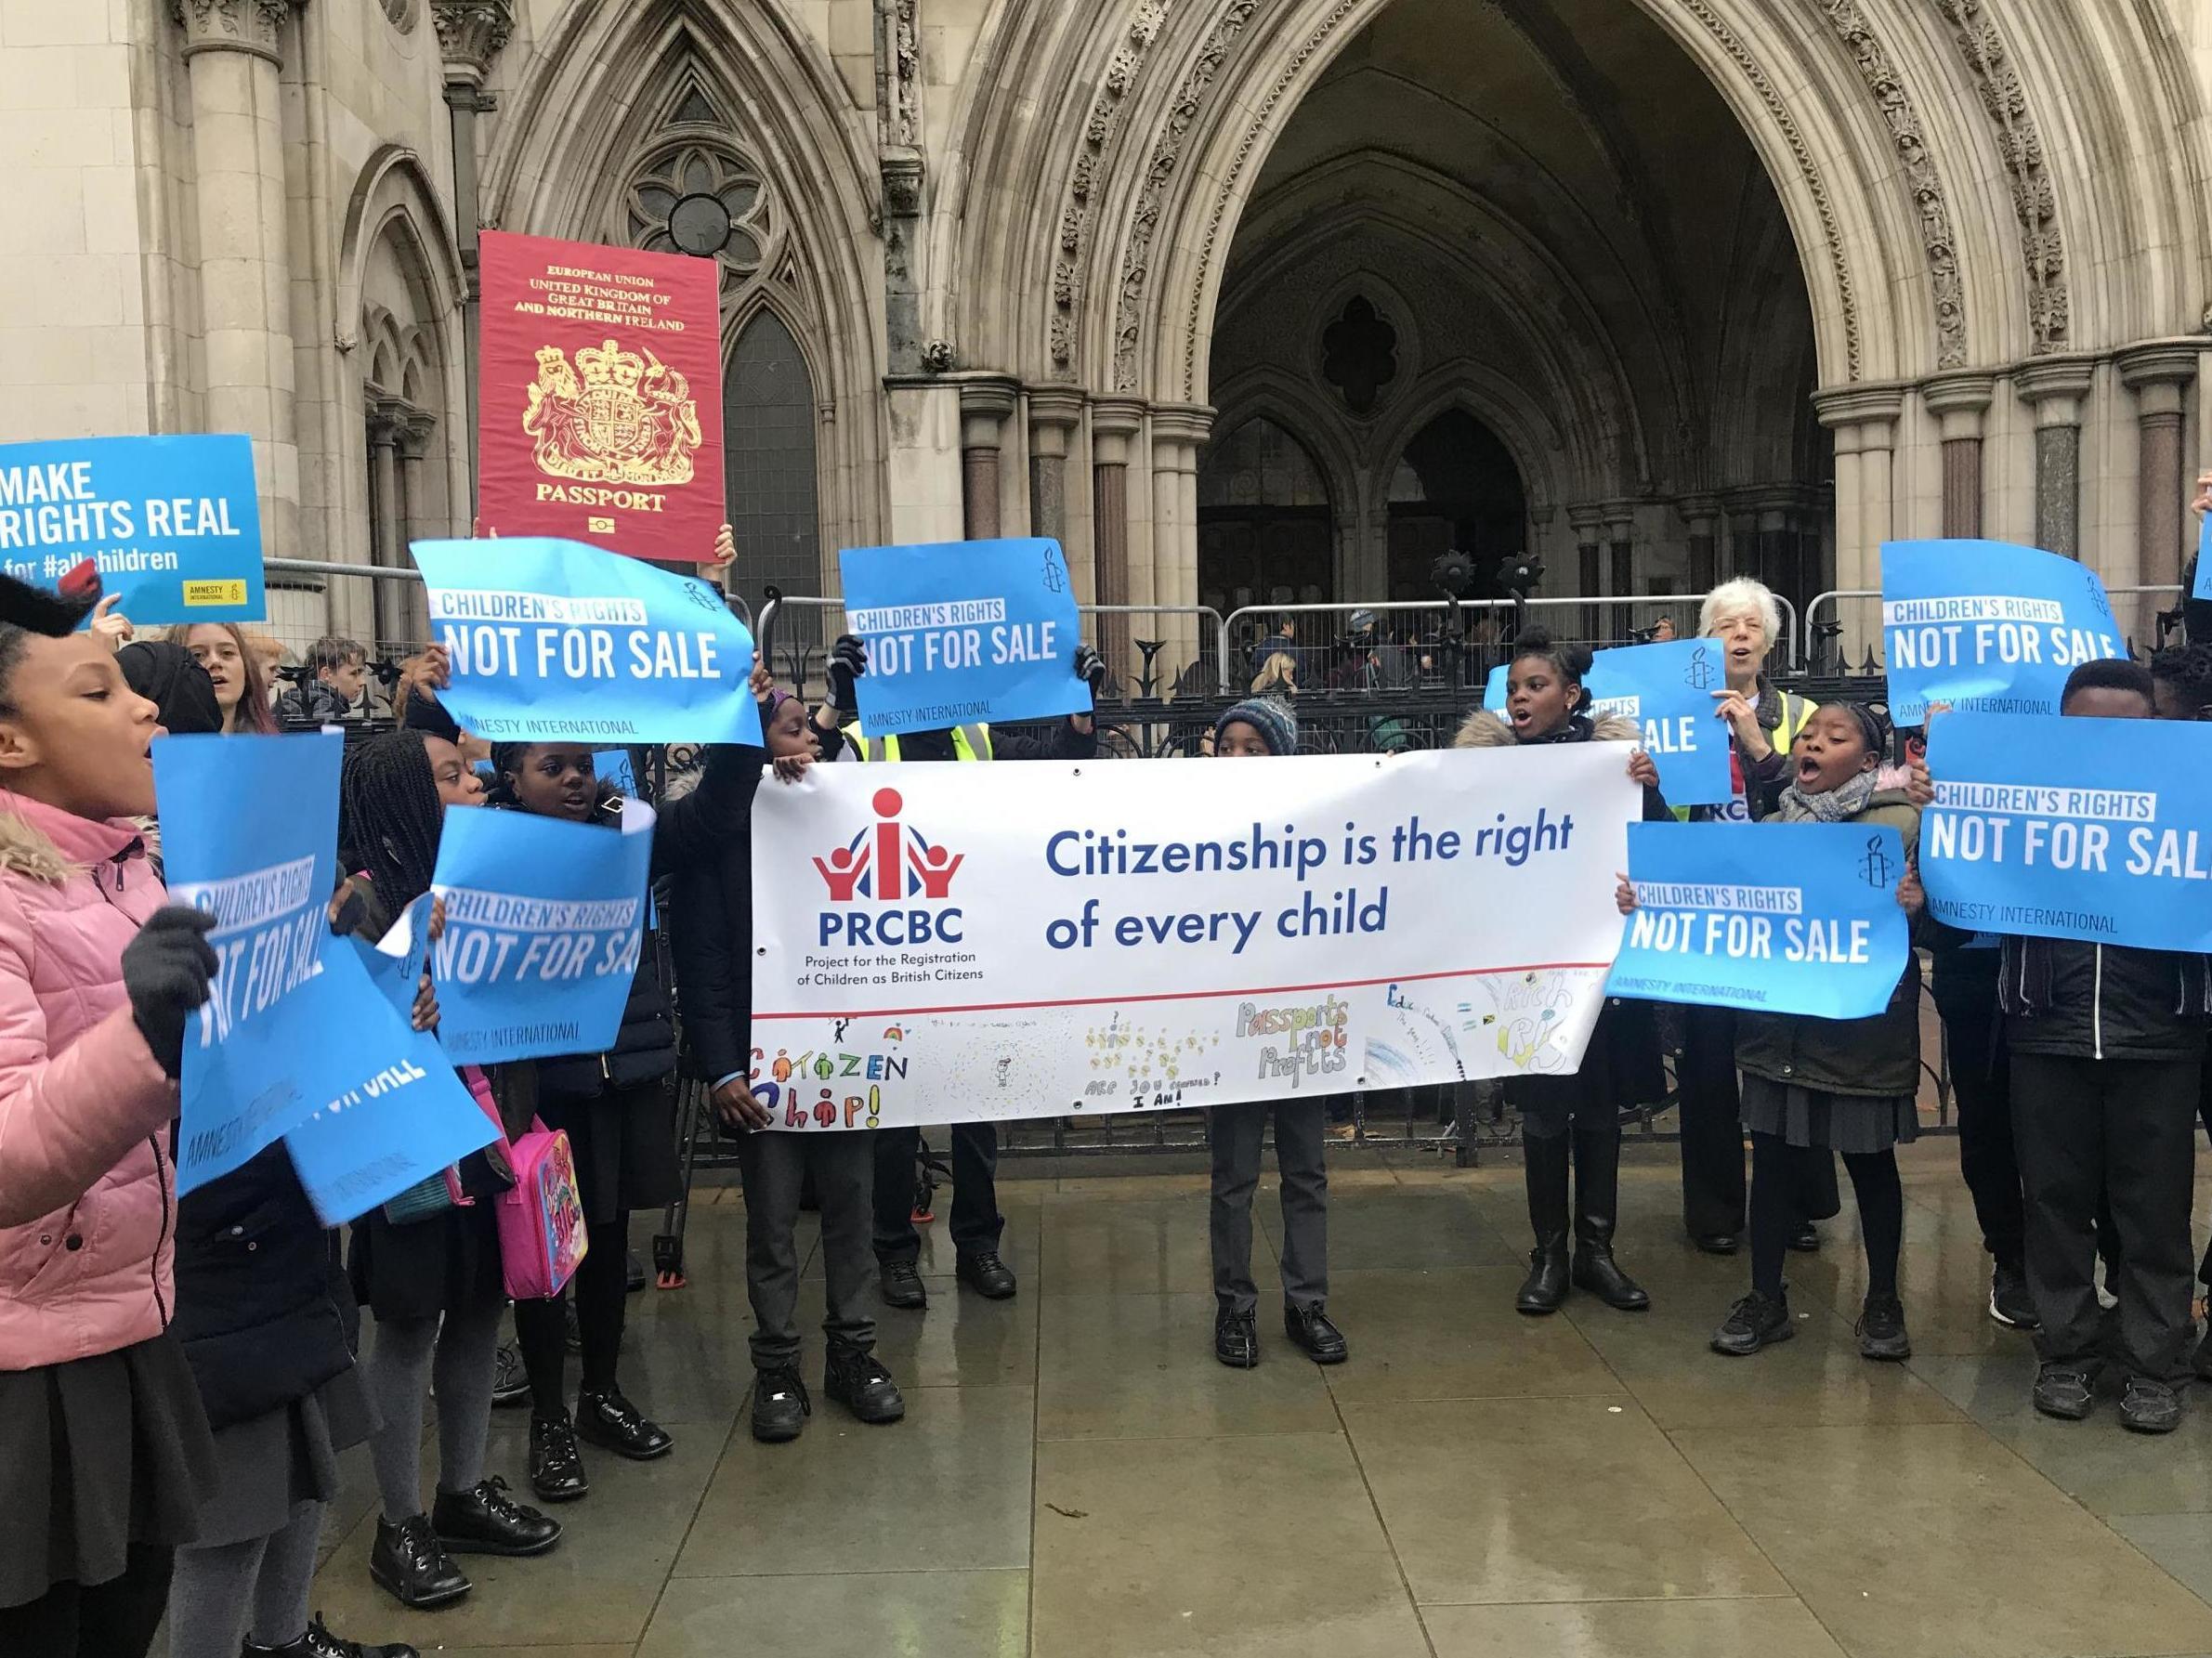 'Exorbitant' Home Office child citizenship fee 'depriving' British-born children of